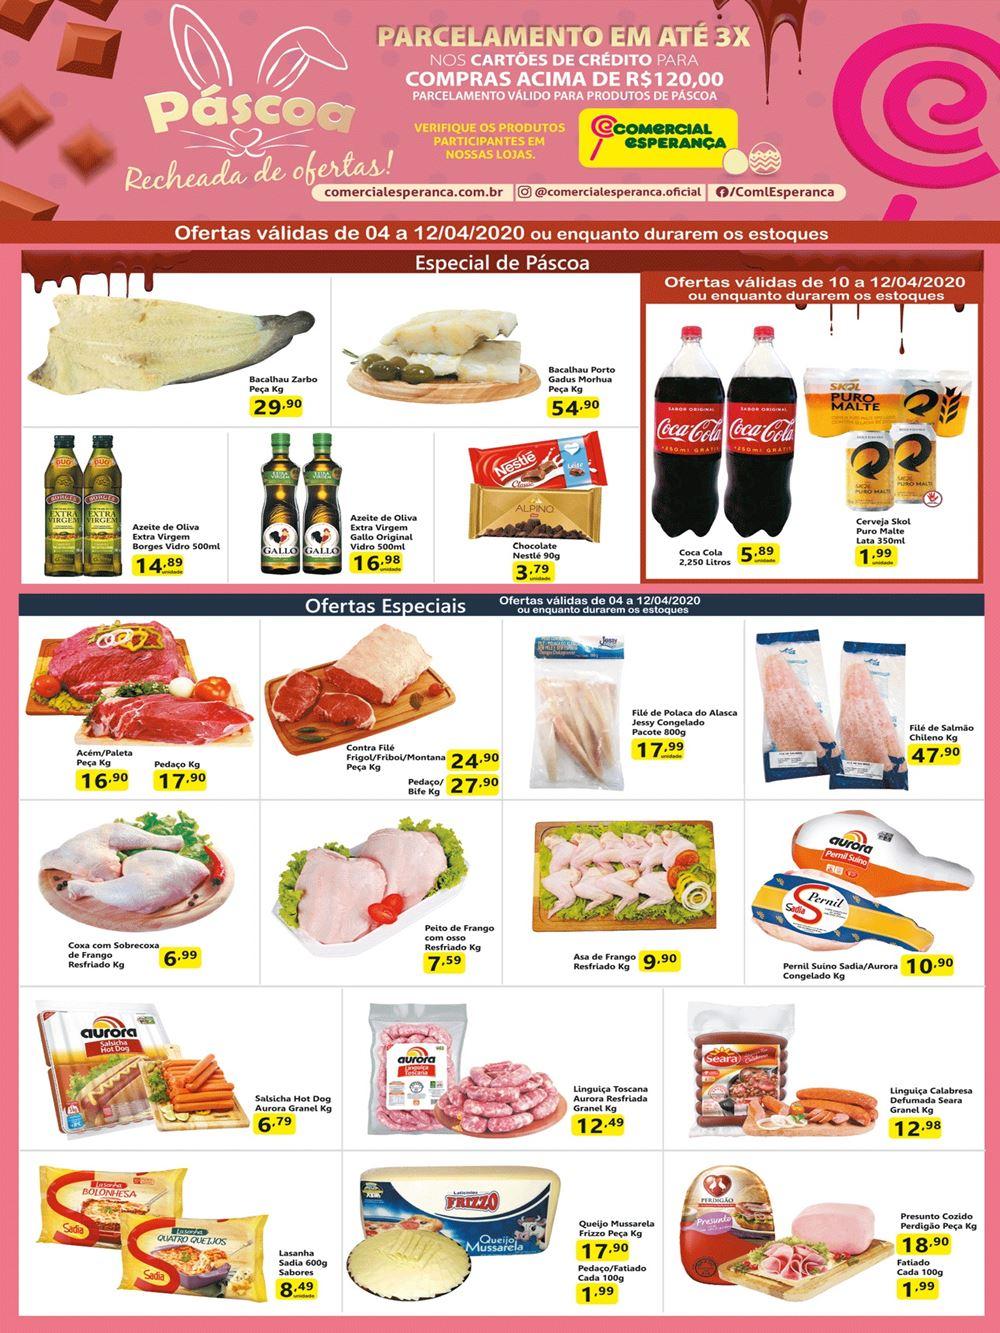 esperanca-ofertas-descontos-hoje1 Ofertas de supermercados - Páscoa